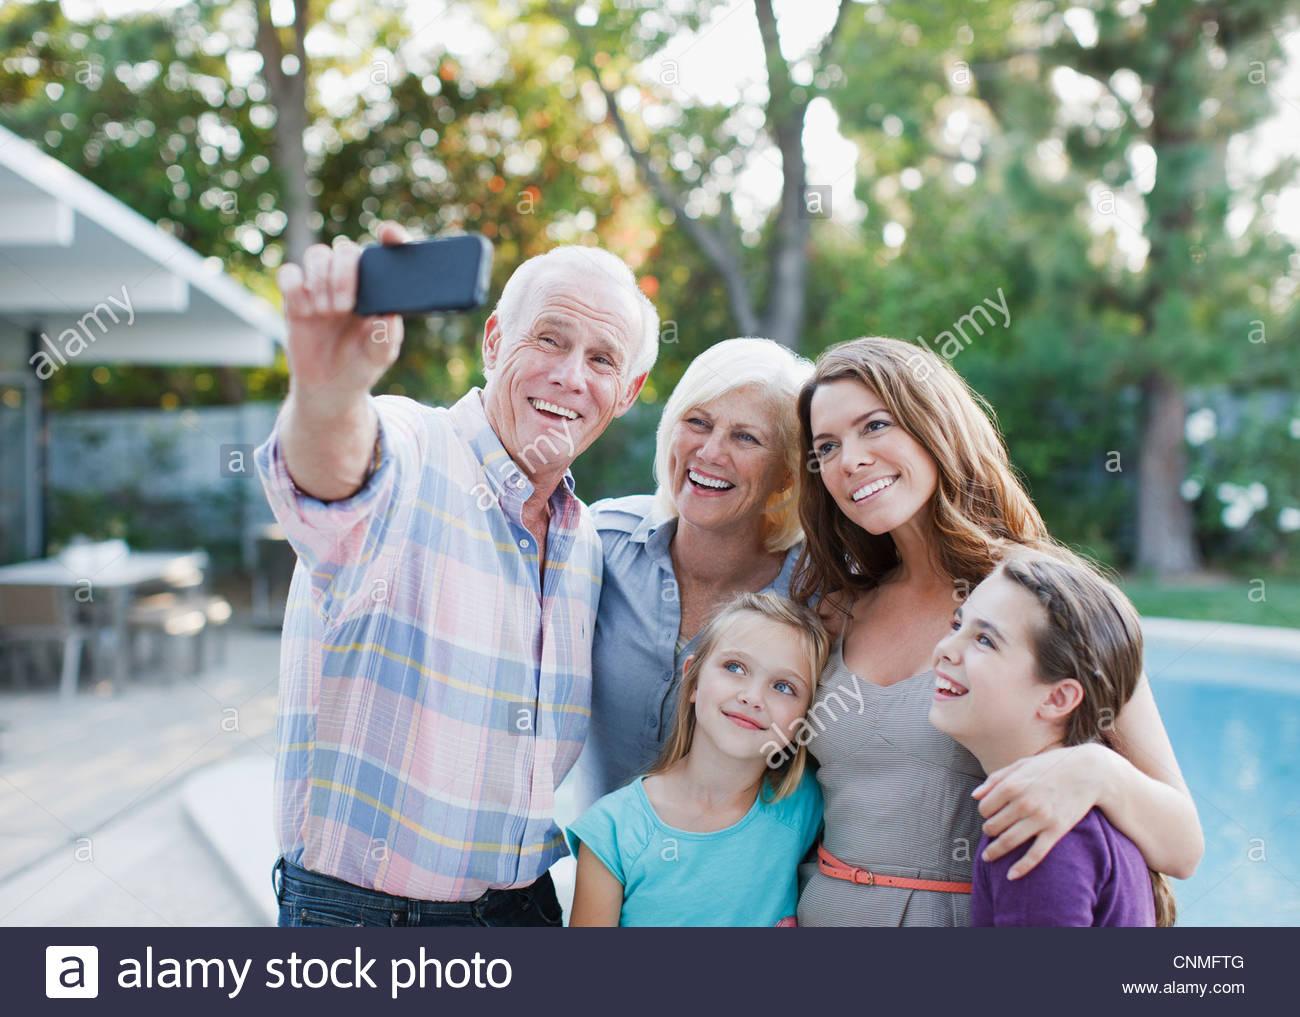 Tomar la foto de familia de sí mismos al aire libre Imagen De Stock